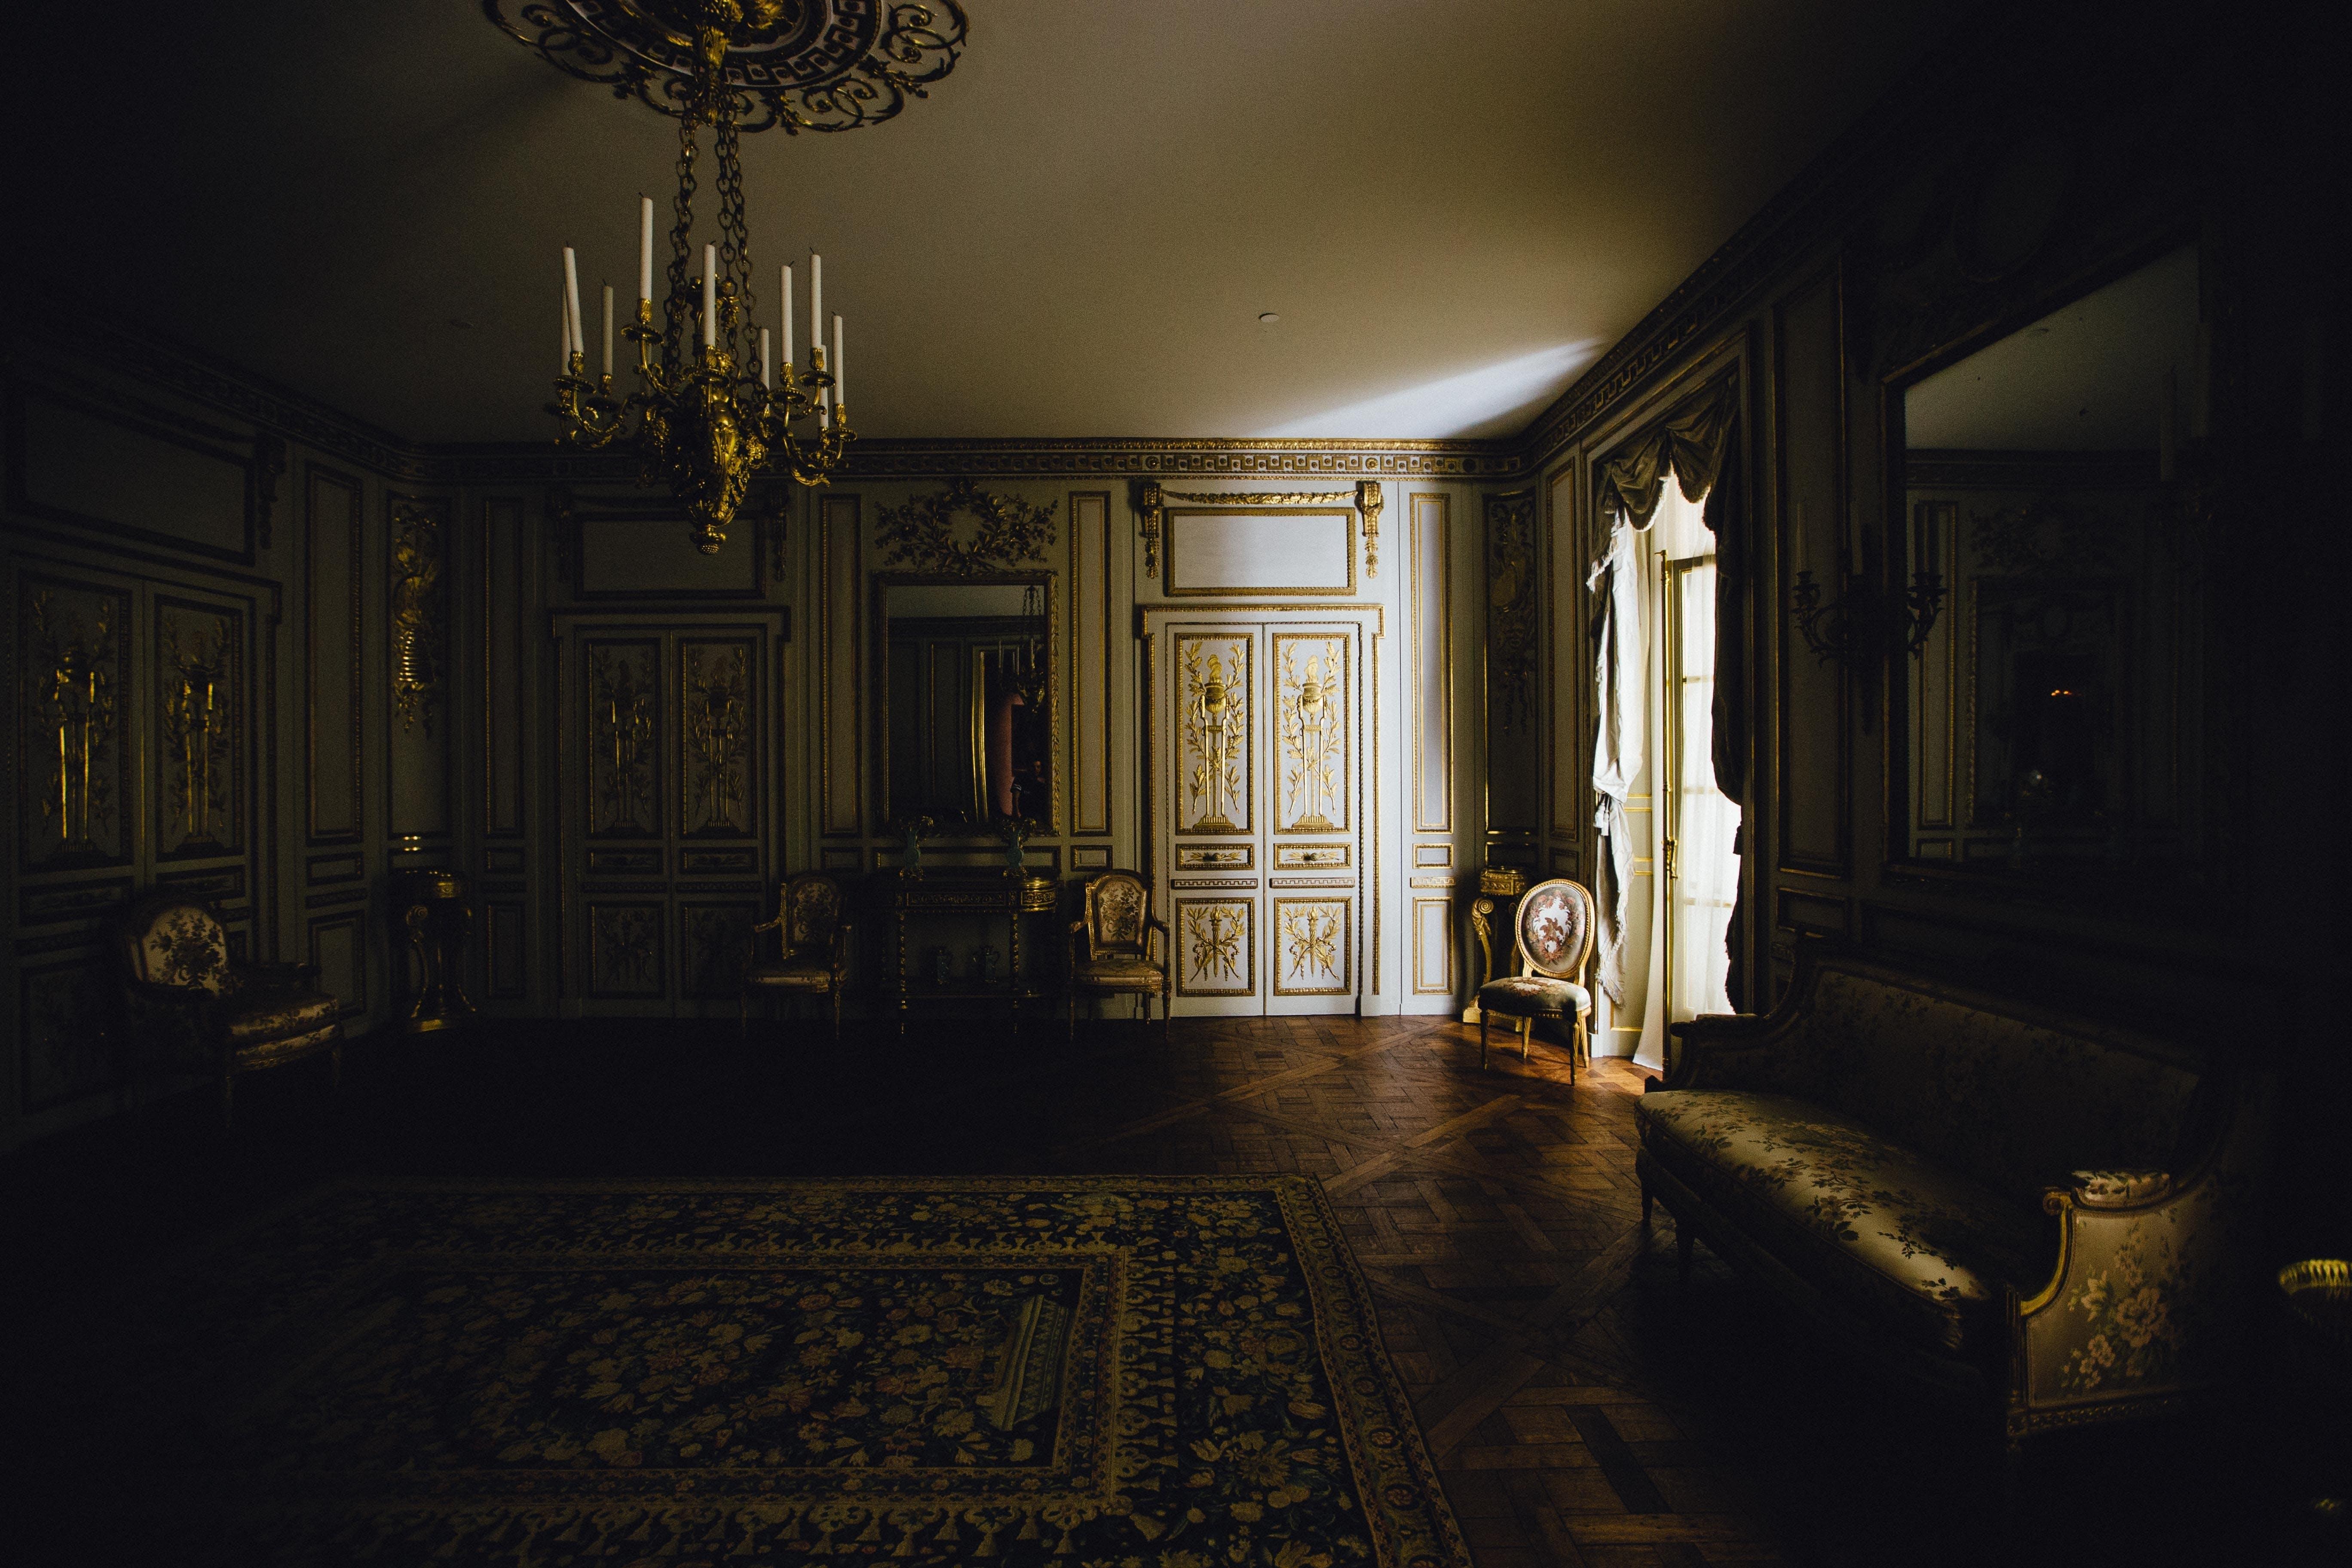 Gold Chandelier in White Room